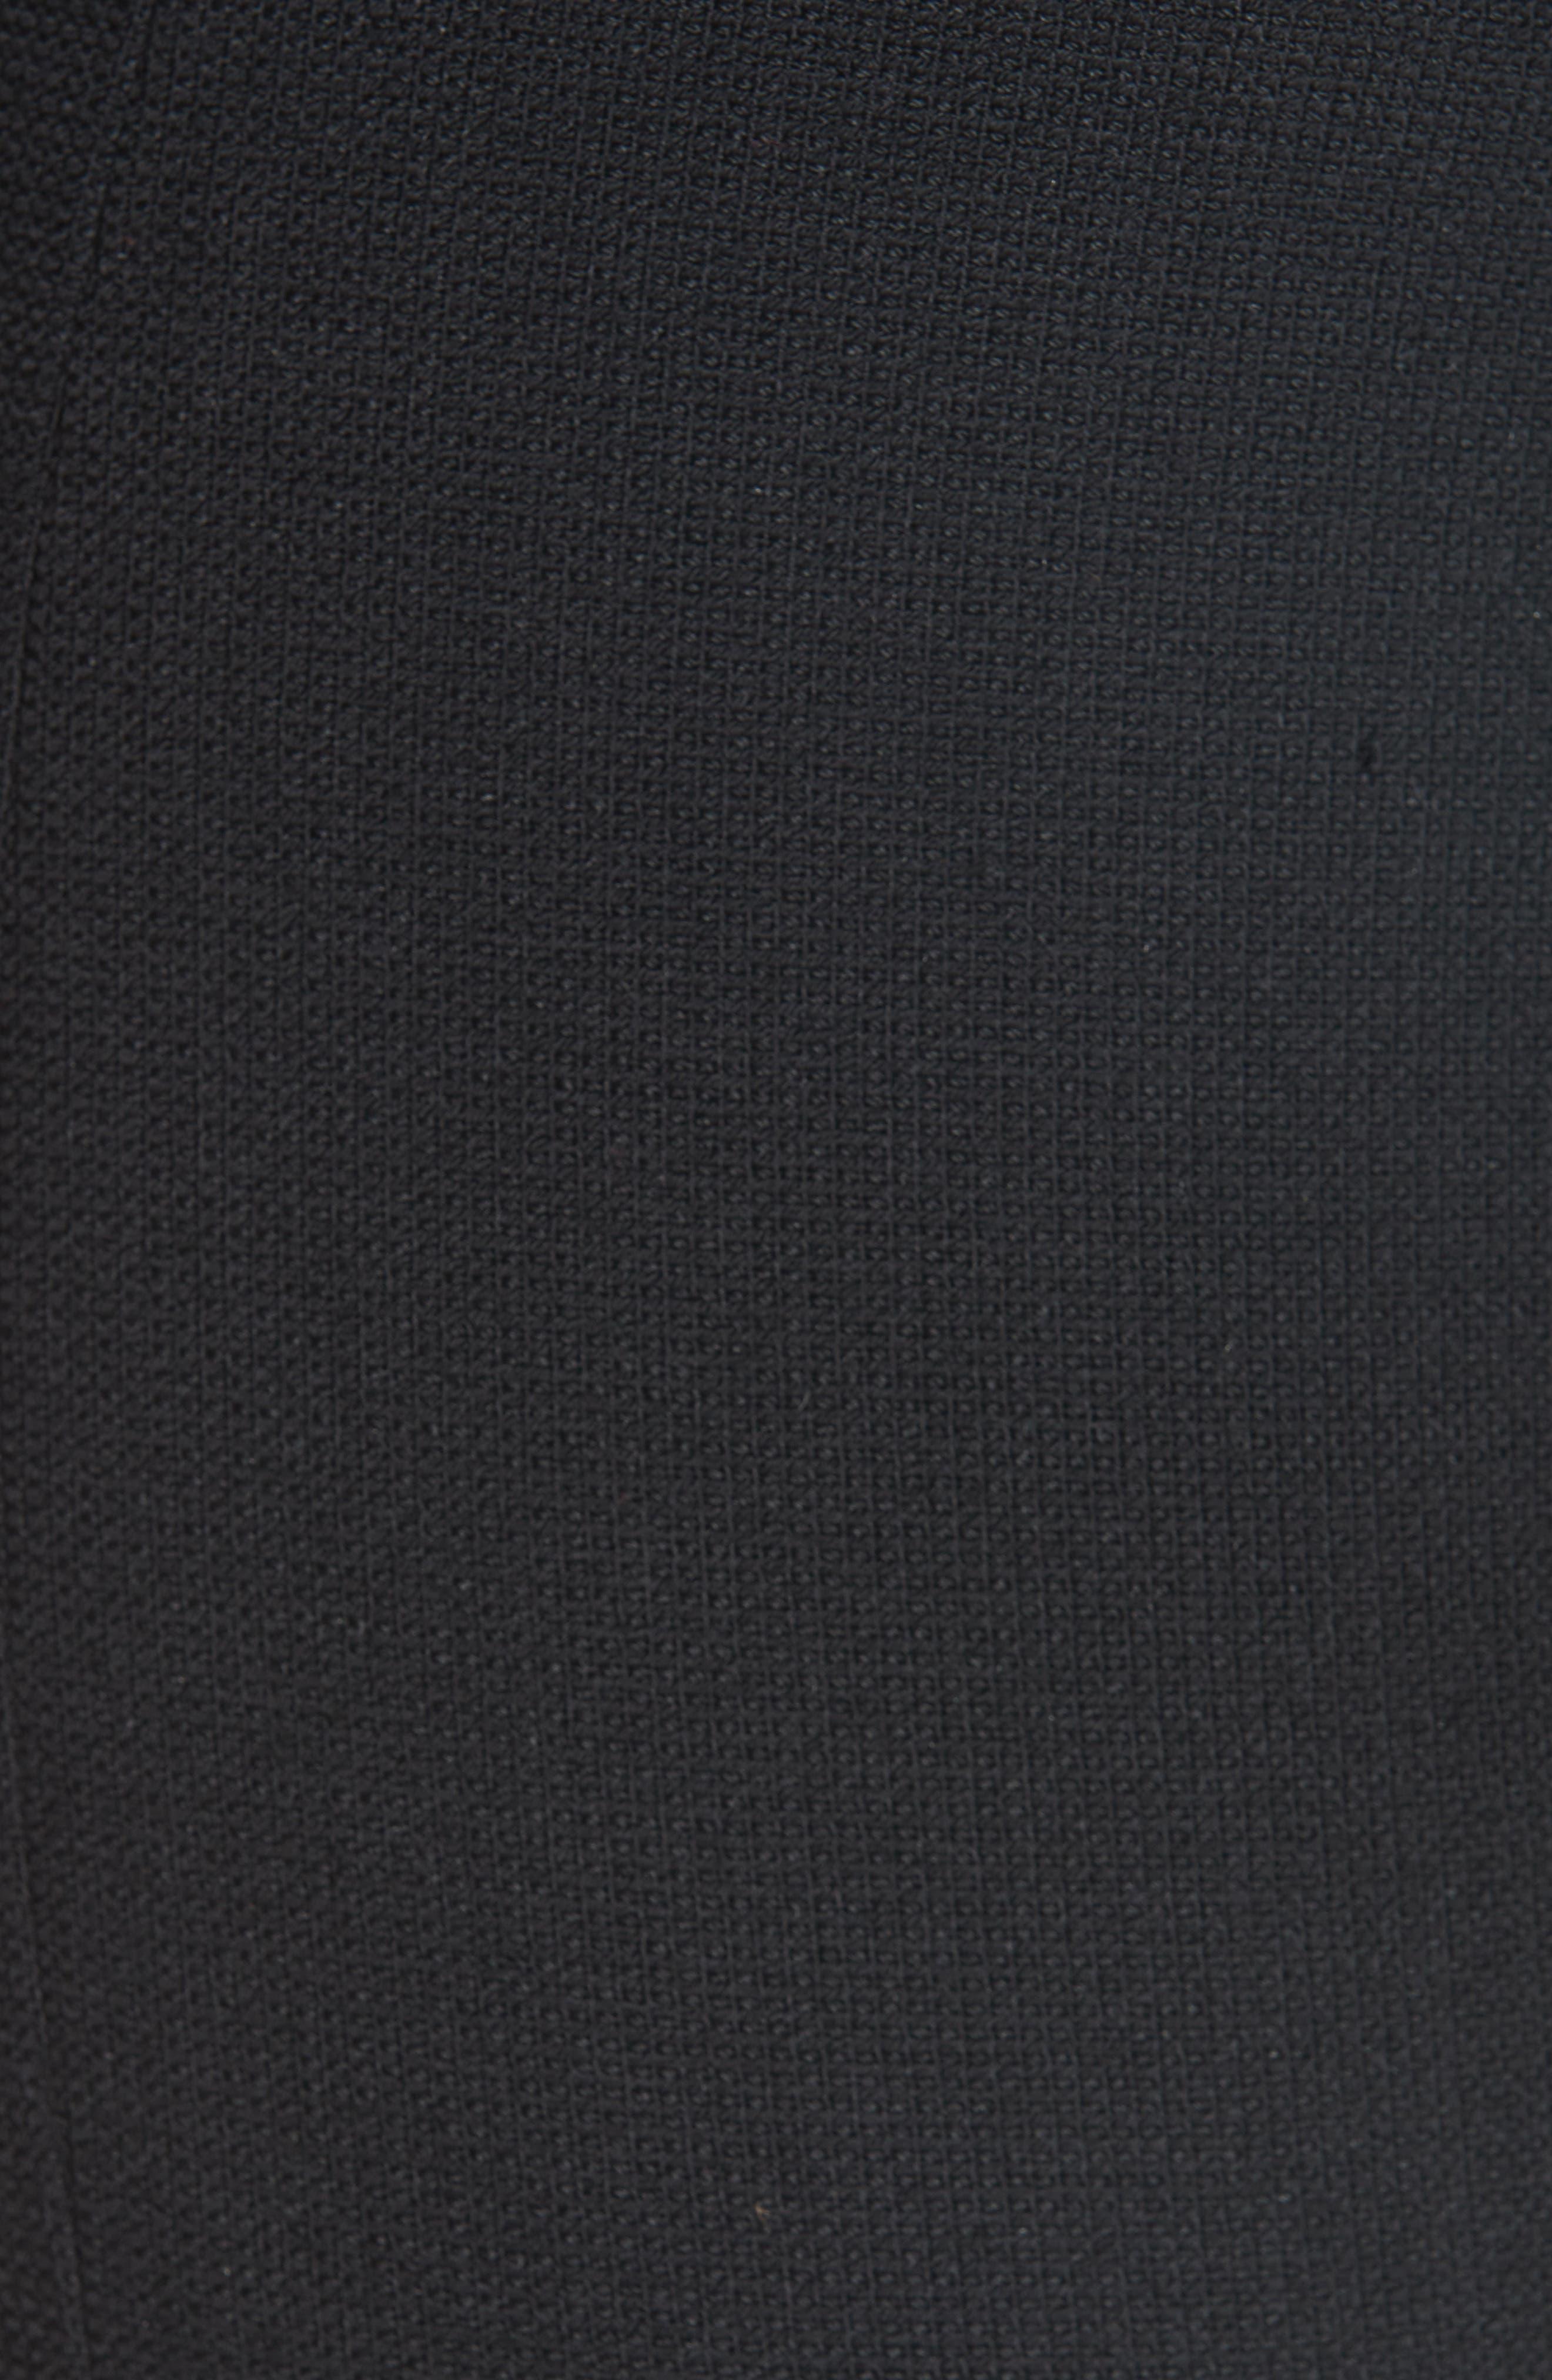 Pull-On Wool Blend Crop Flare Pants,                             Alternate thumbnail 5, color,                             BLACK PIQUE